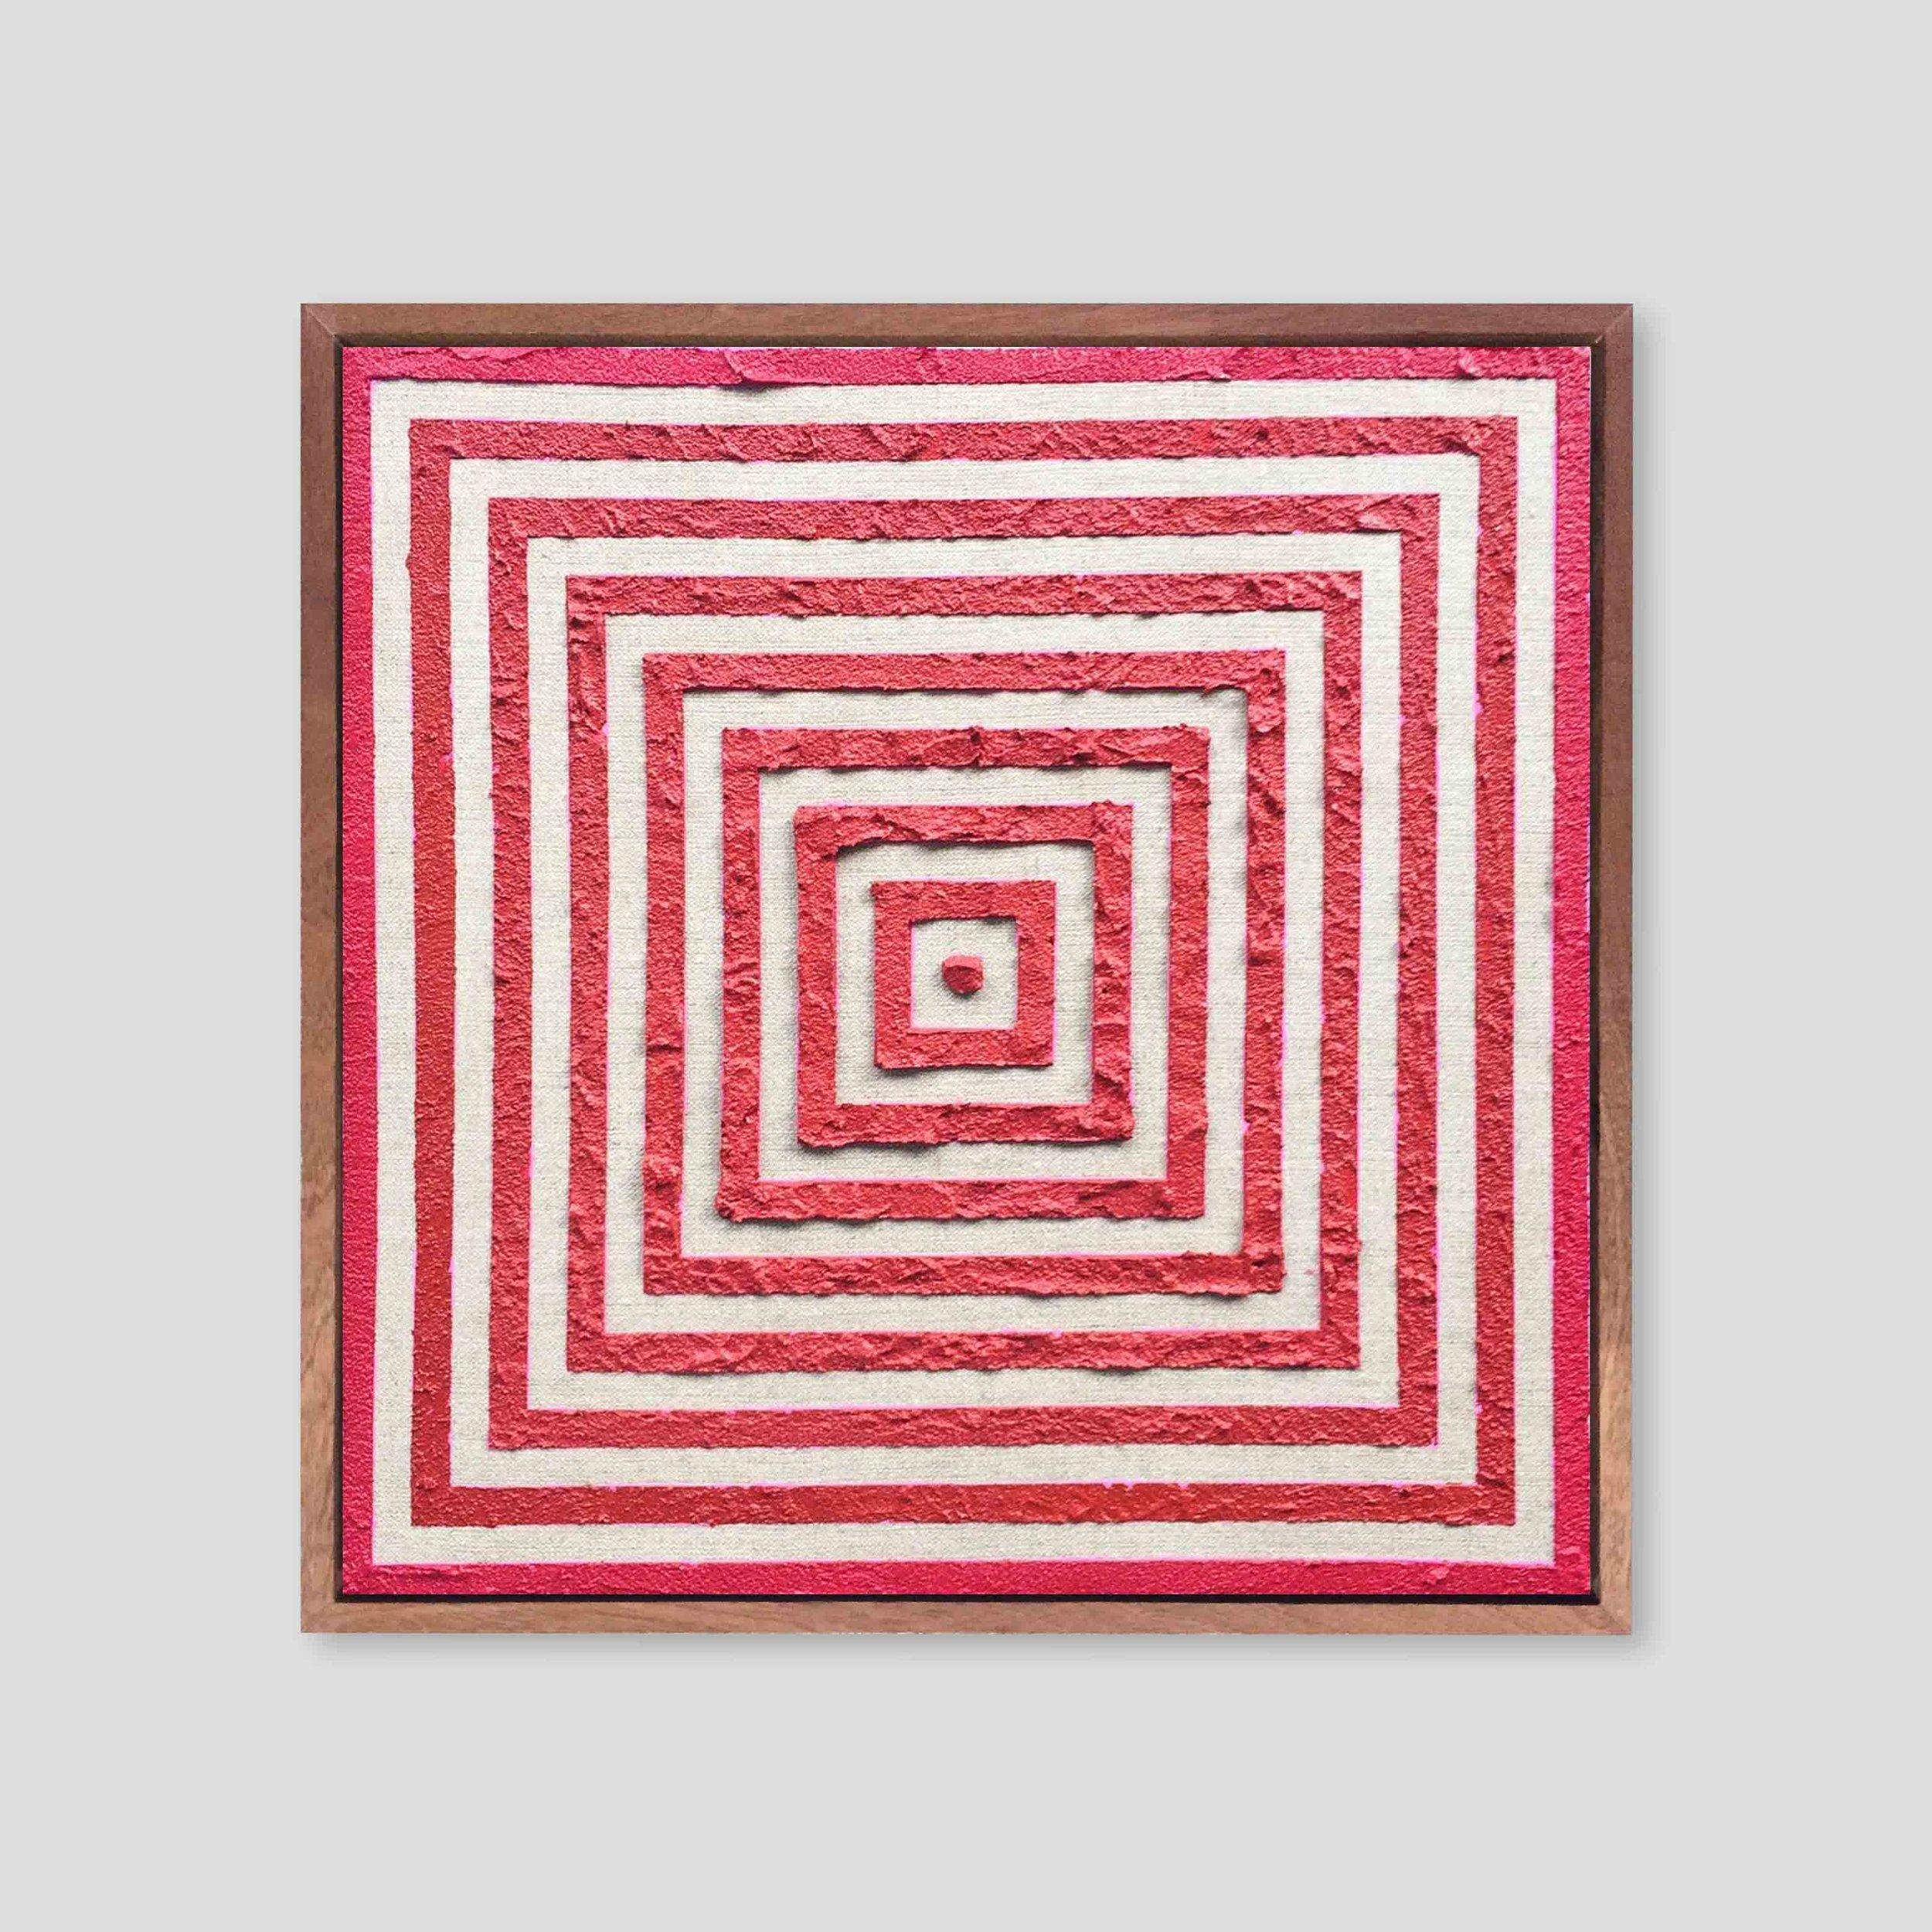 centralised stripes canvas.jpg